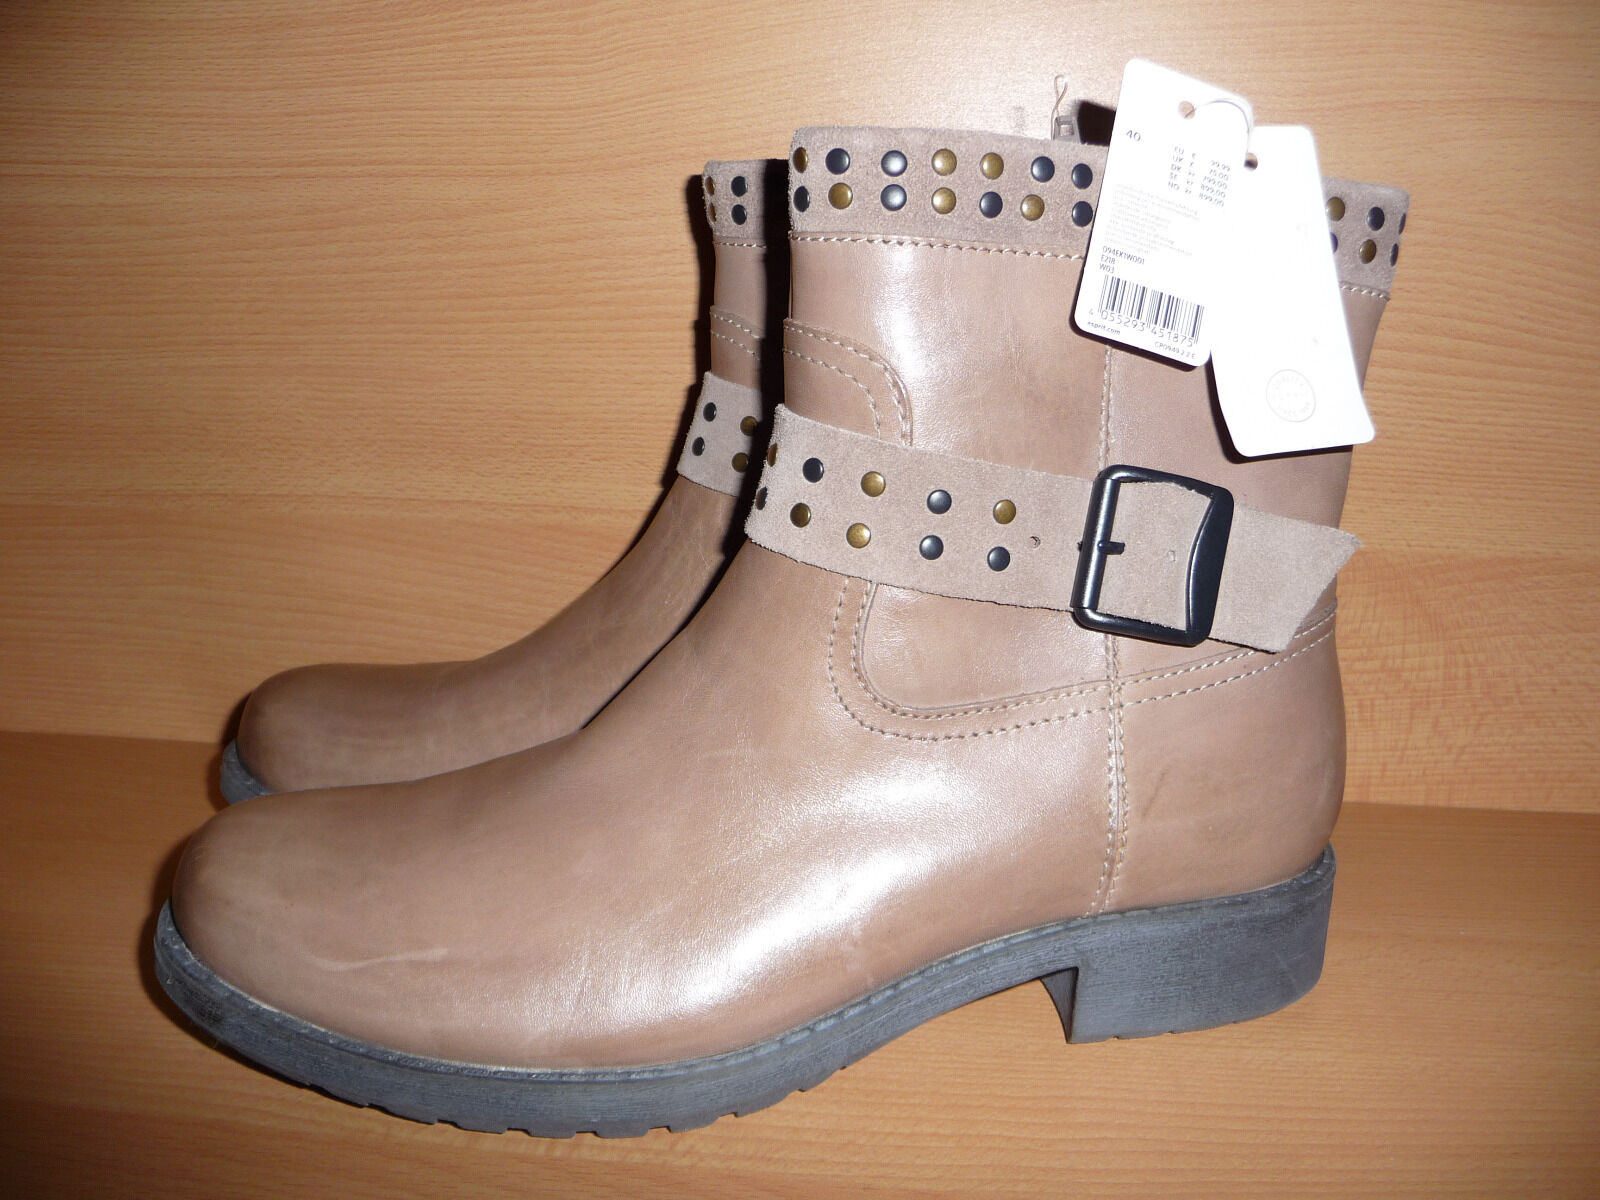 ESPRIT Stiefel Damen Stiefel ESPRIT Stiefel Stiefelette Schuhe, Leder, Beige, Gr. 40, NEU addec2